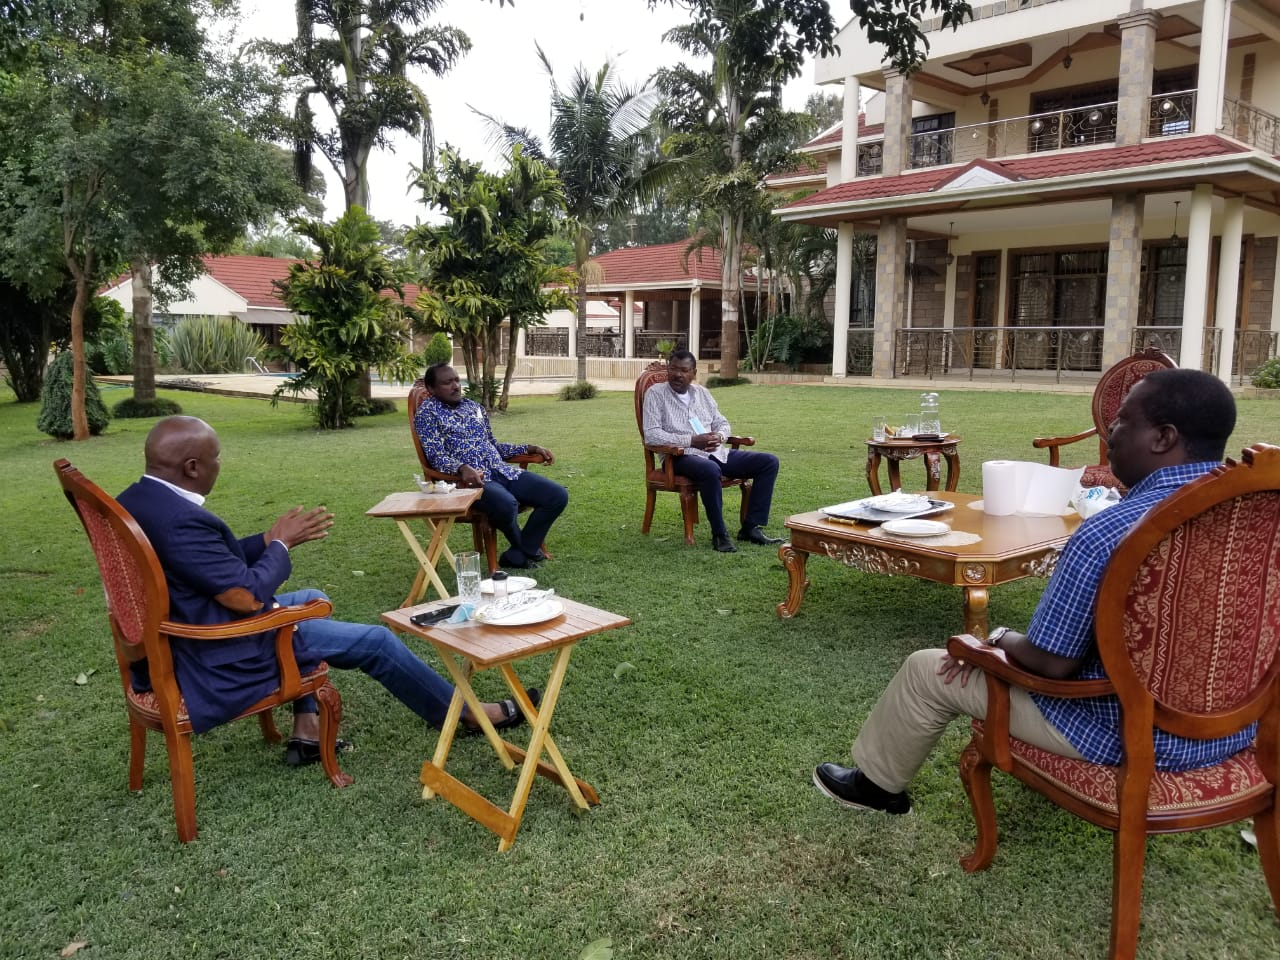 Gideon Moi Lectures Kalonzo, Mudavadi And Wetangula In A Meeting